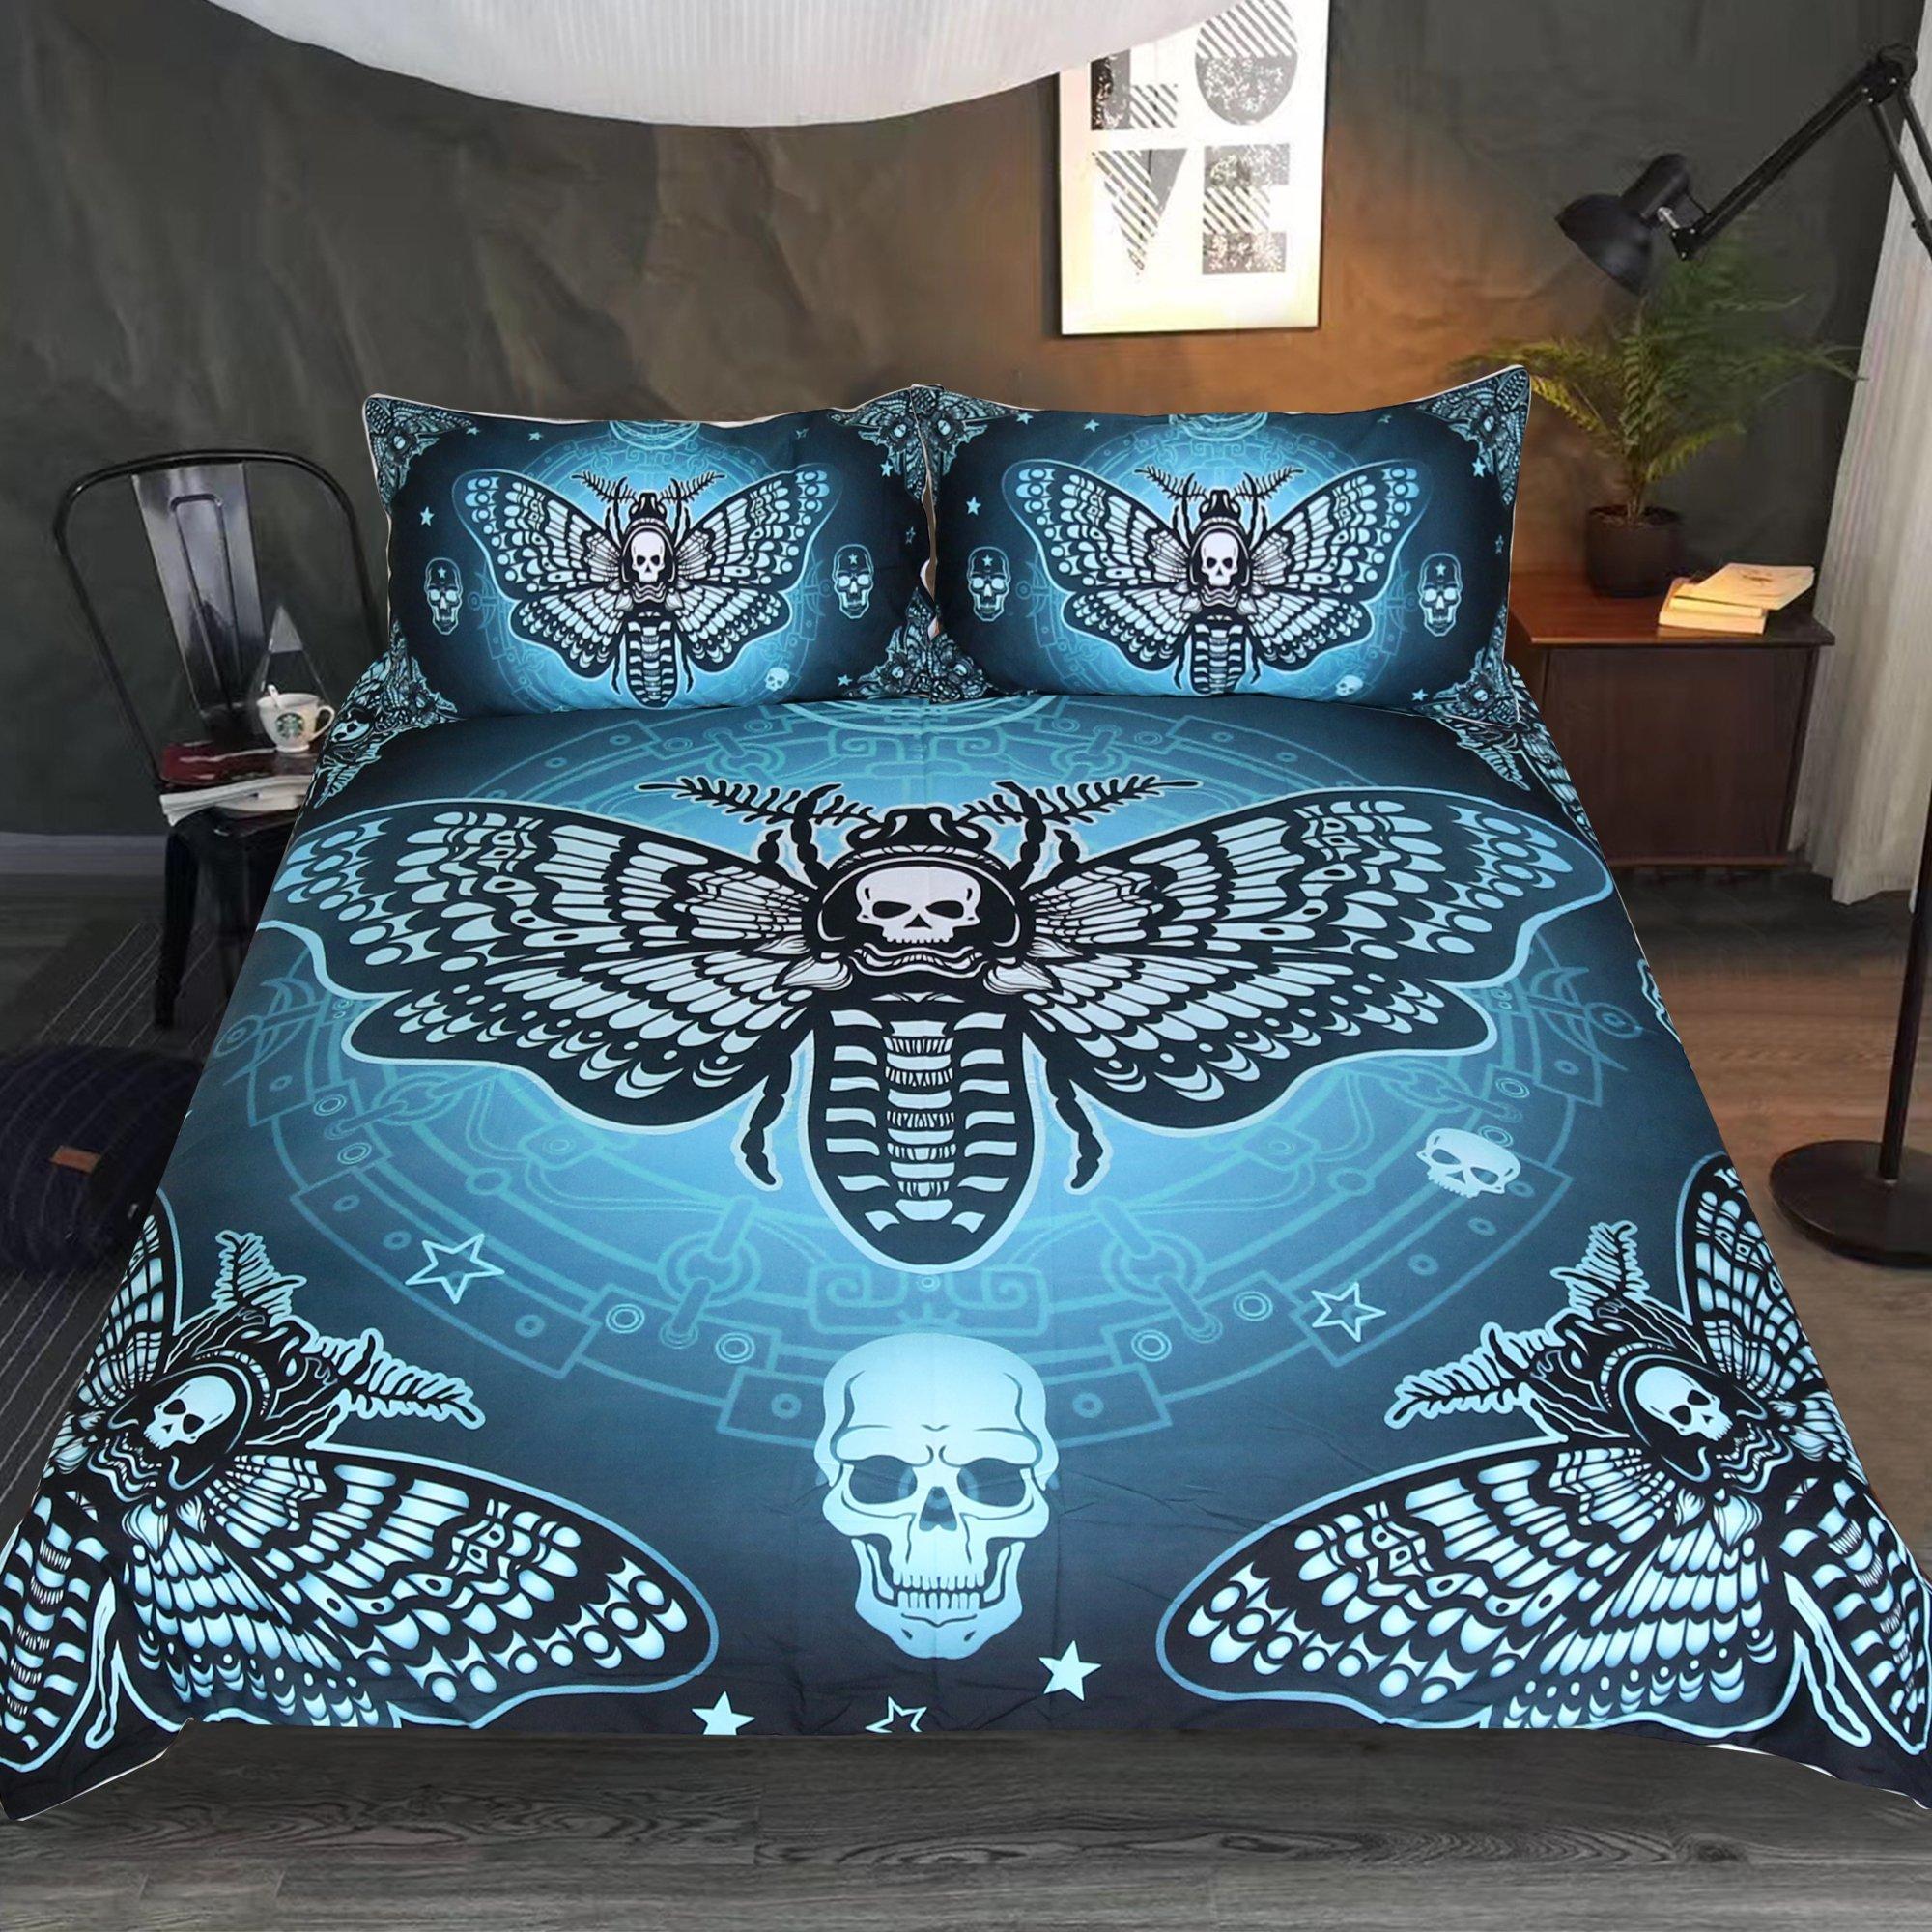 Sleepwish Skull Moth Bedding 3 Piece Dead Moth with Stars Butterfly Skull Duvet Cover Blackish Green Gothic Halloween Bed Set (King)